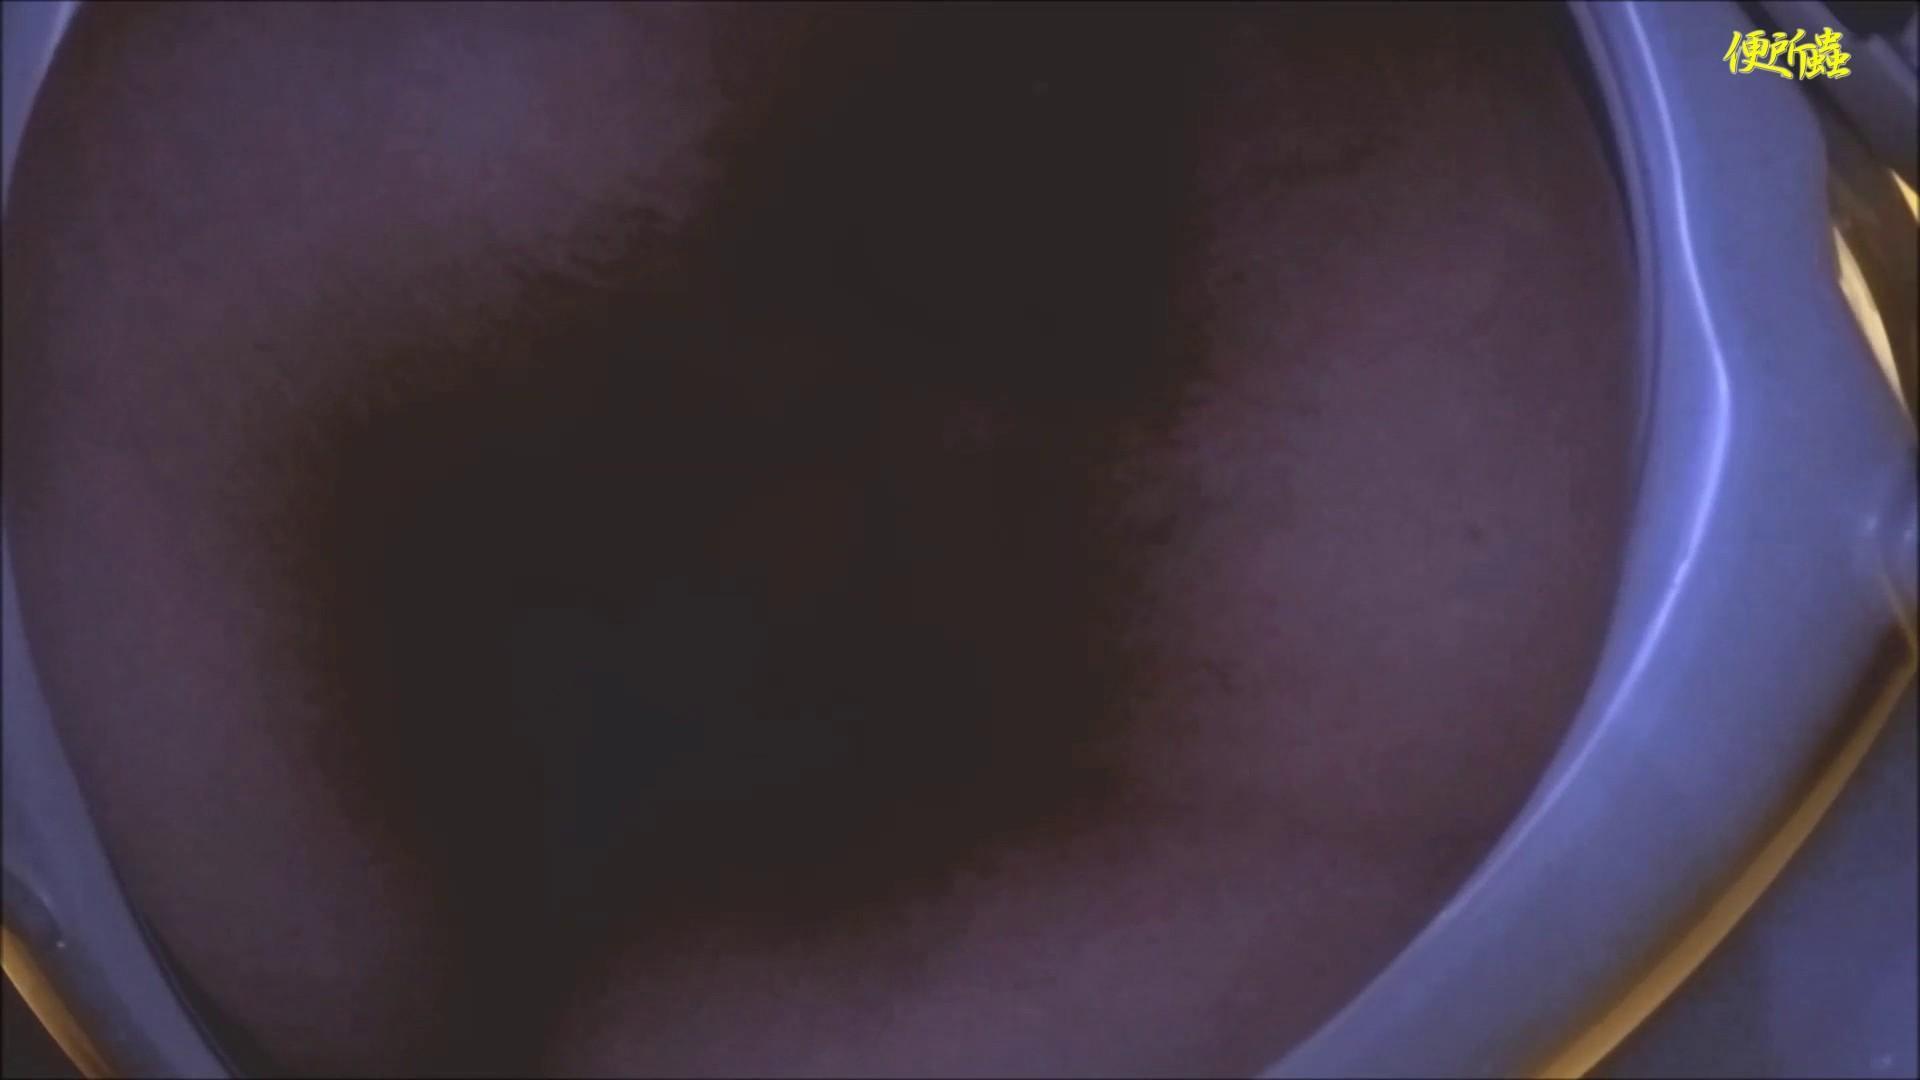 vol.07 便所蟲さんのリターン~寺子屋洗面所盗撮~※画質改善※総勢7名 盗撮  56PIX 22